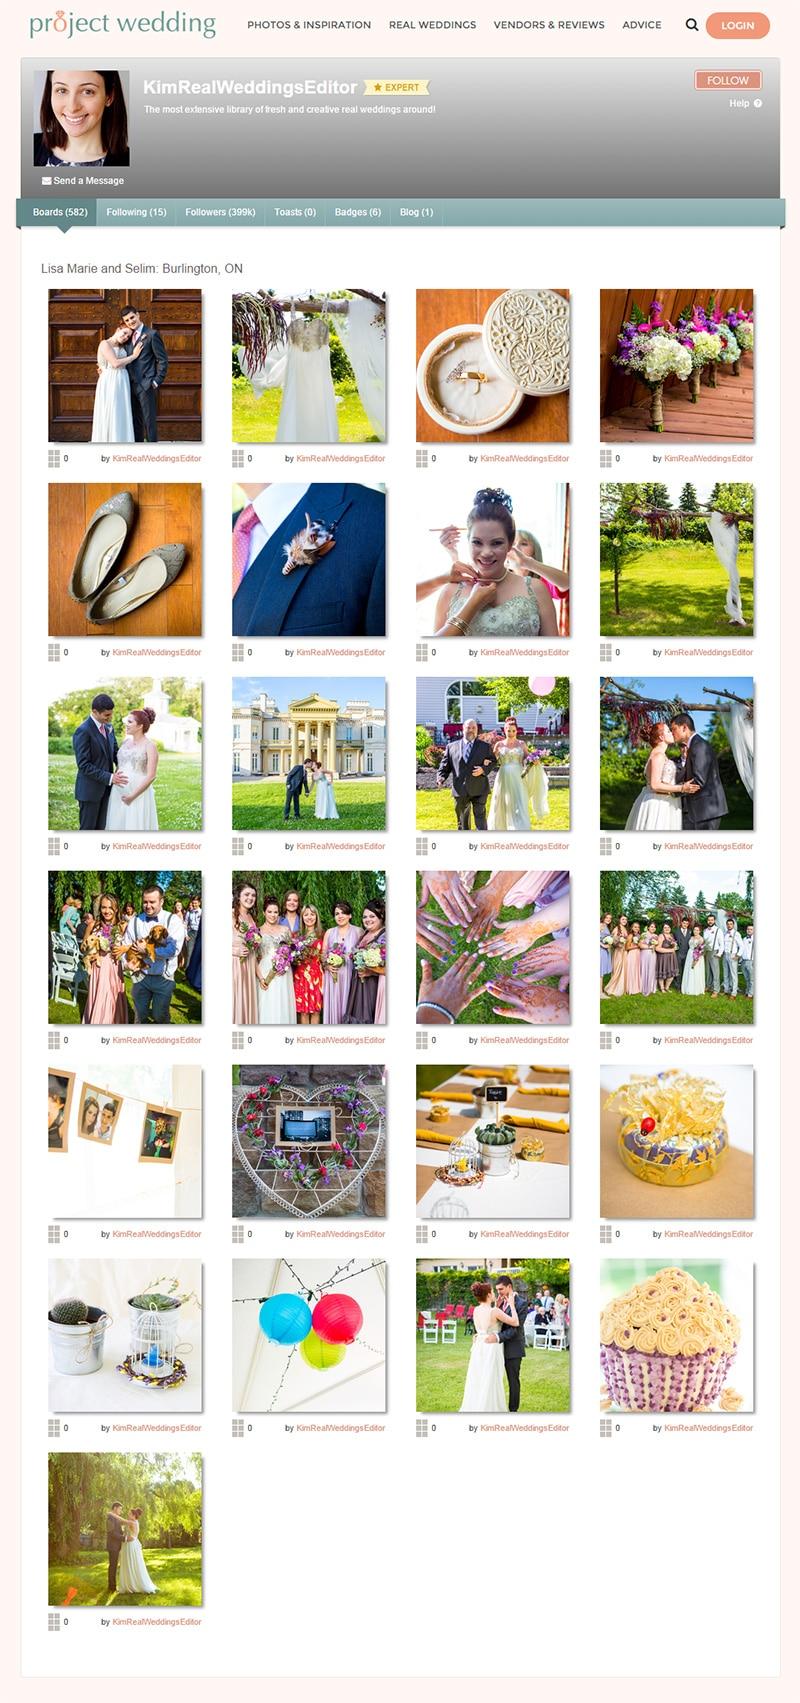 projectwedding-lisa-marie-and-selim-burlington-wedding